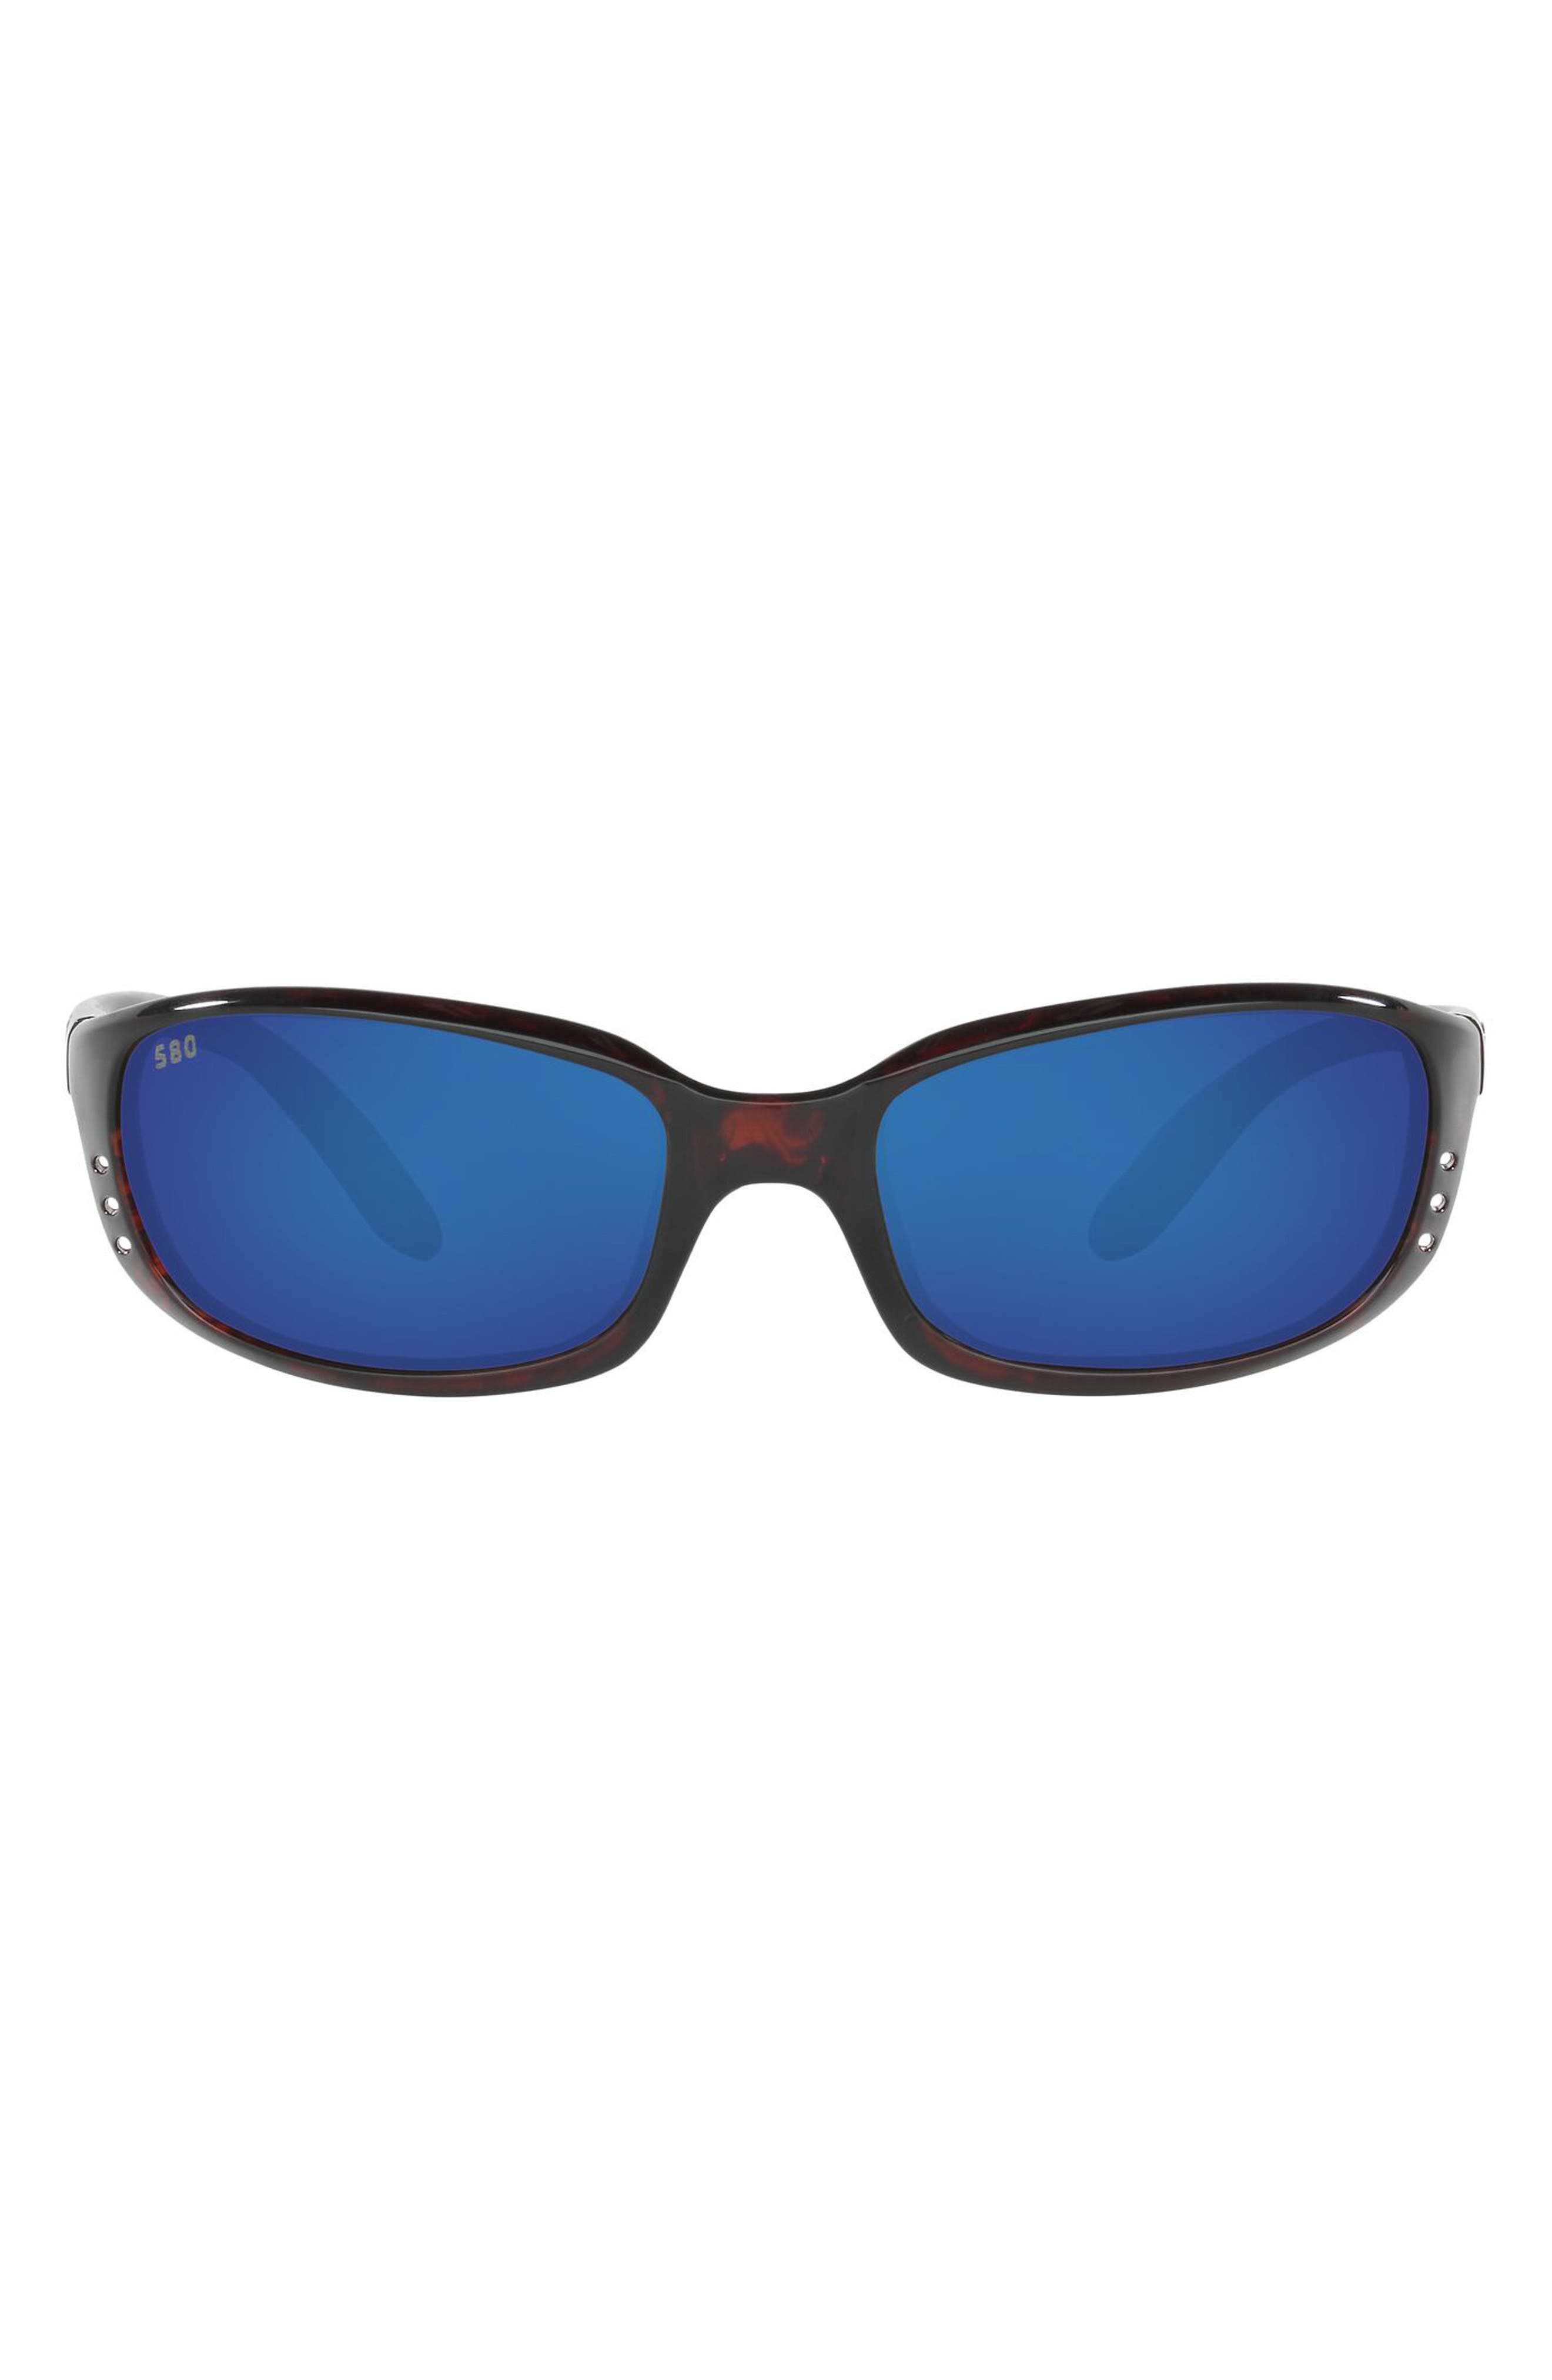 59mm Polarized Wraparound Sunglasses